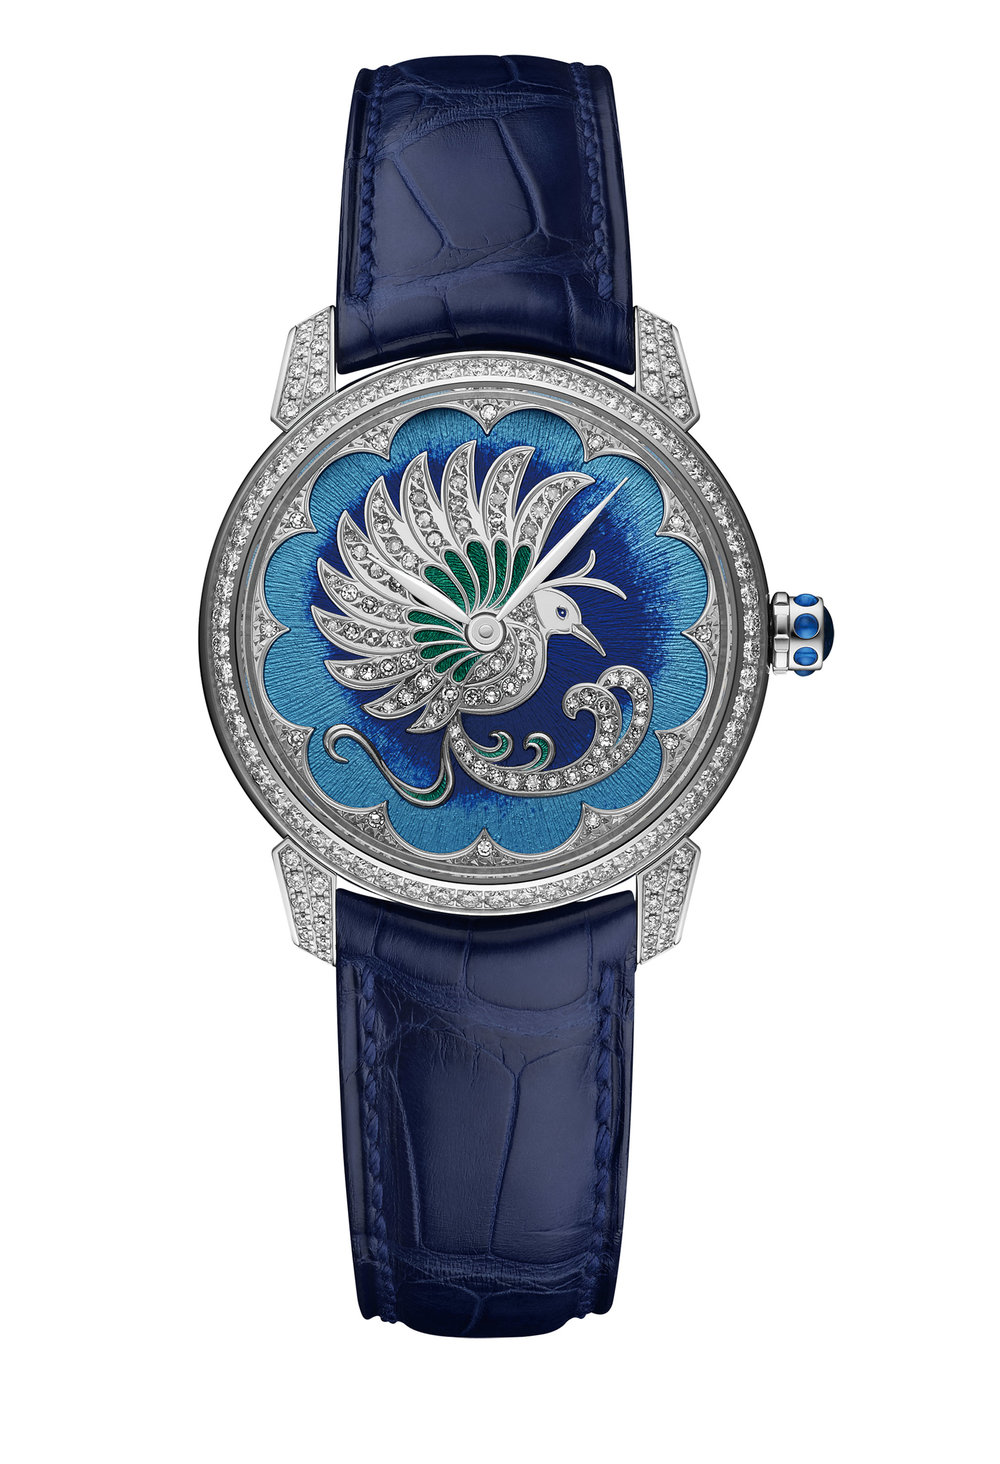 Ulysse Nardin   Classico Lady Watch Ref. 8150-112-2/PB, $47,000  雅典經典系列女裝腕錶一直以華麗的裝飾之美為特色。此款以躍然飛起的鳥兒為主題,18K白金錶殼上鑲嵌有細密明亮的鑽石,當中藍色漸變琺瑯錶盤上,一隻線條流暢、翩然起舞的天堂鳥在花朵形外圈的環繞下愈加璀璨動人。錶冠上裝飾有藍寶石,藍色鱷魚皮錶帶。防水50米。    At Global Watch, (604) 684-6515,  ulysse-nardin.com